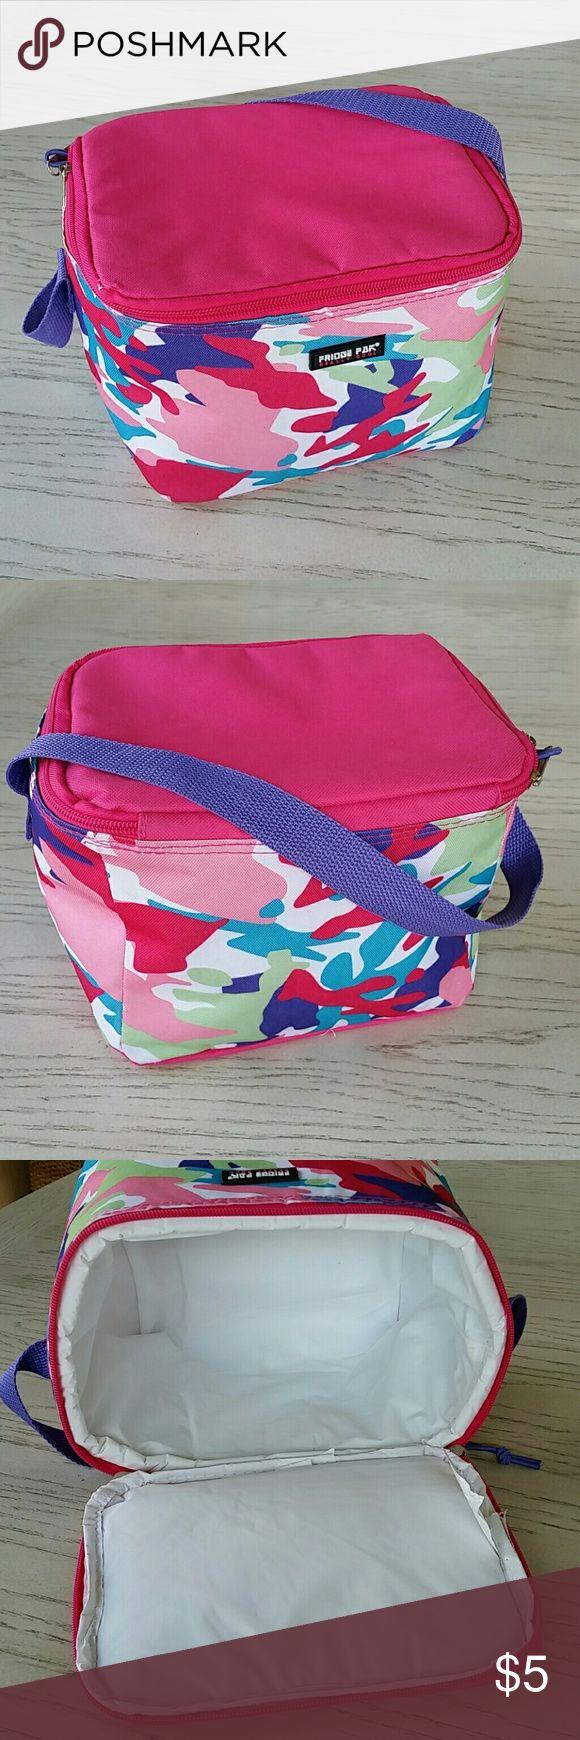 Fridge Pak Small Cooler Bag Preowned Fridge Pak cooler in camo pink, used once, dual top zipper,  clean interior, L9 x H6.5 x W7. Bundle to save 30%. Fridge Pak Bags Mini Bags